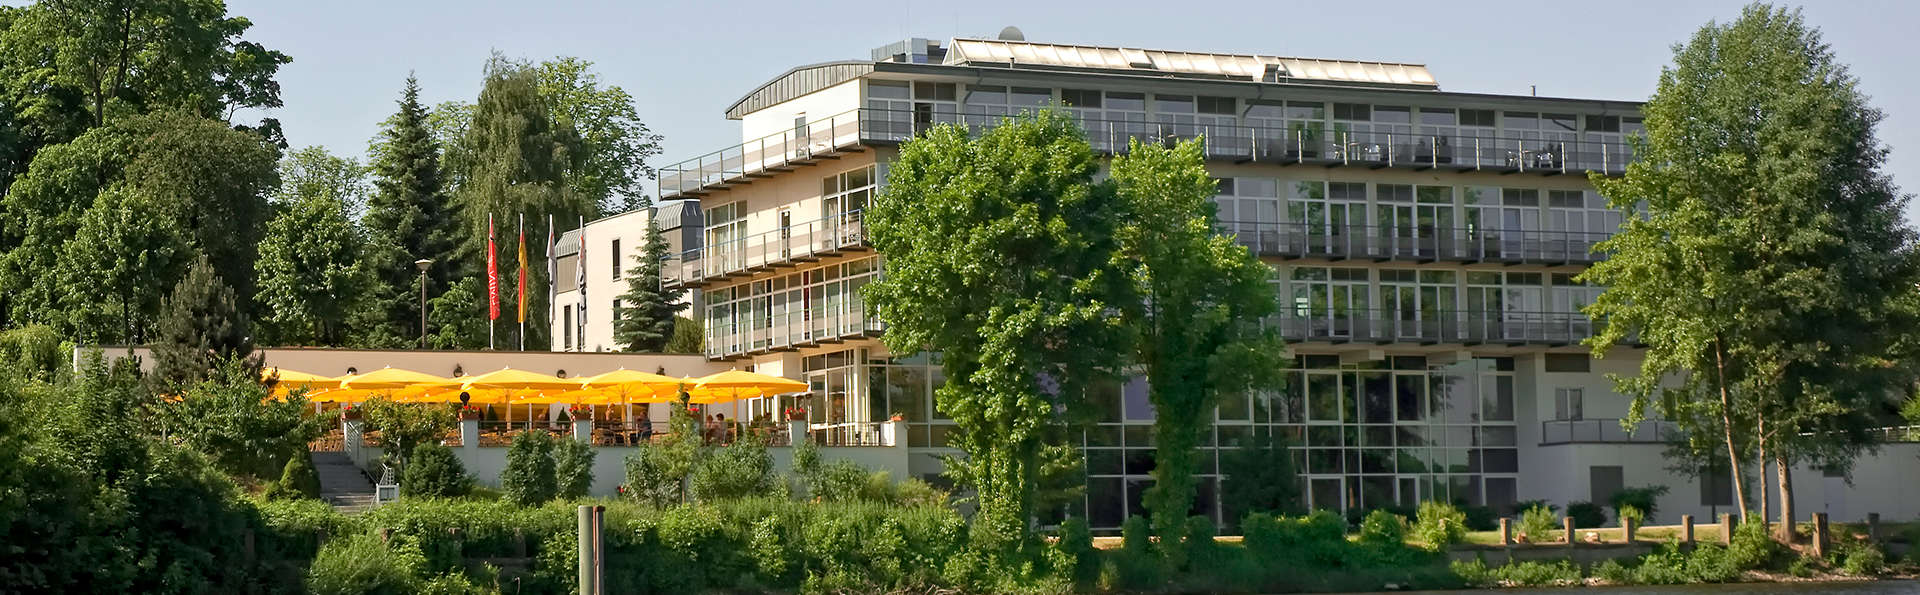 Seminaris Avendi Hotel Potsdam - Edit_Front2.jpg